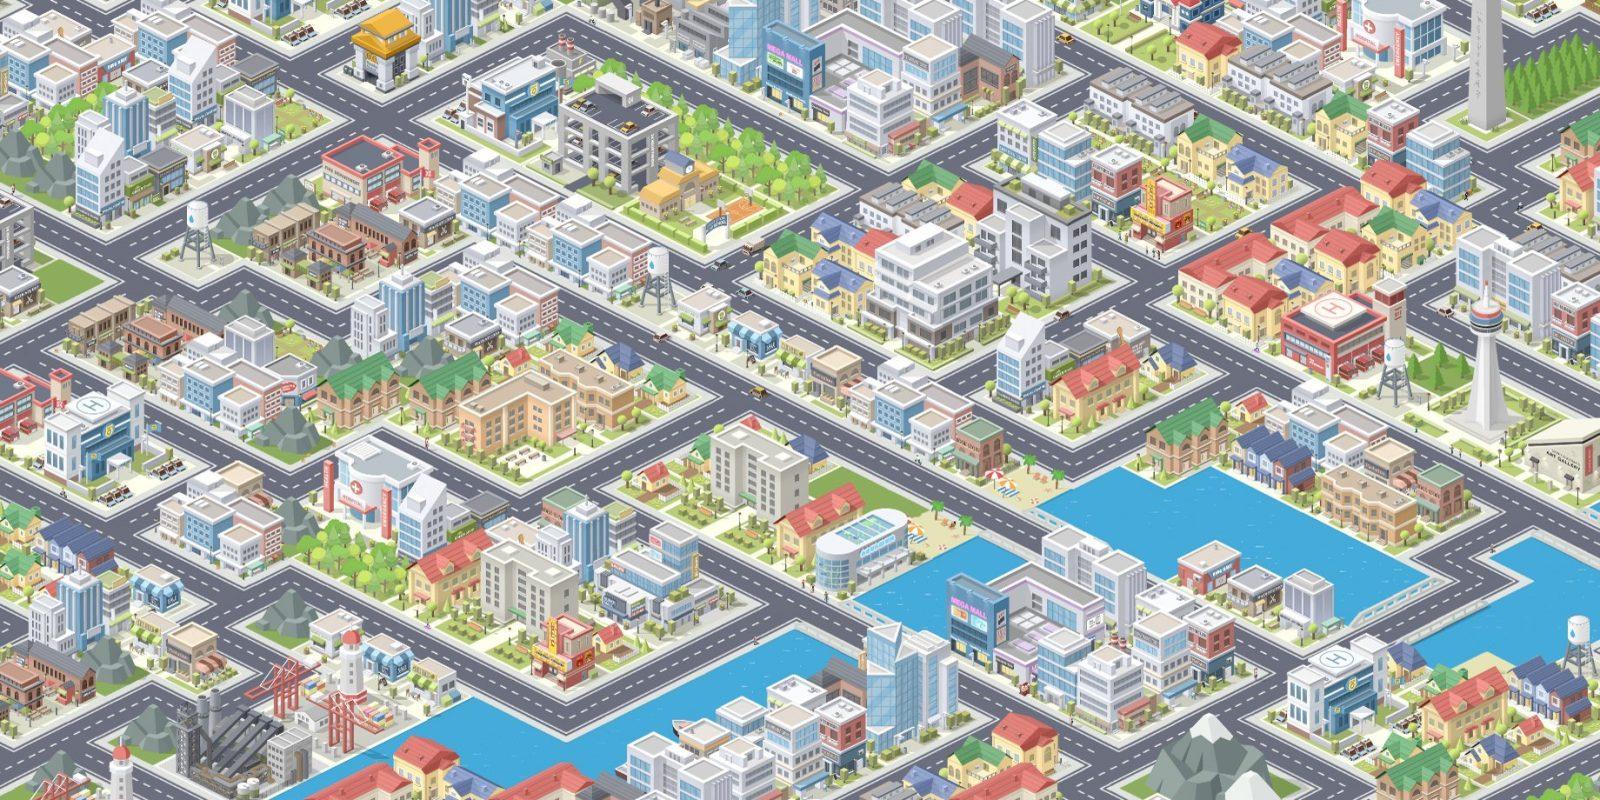 Today's Best iOS & Mac App Deals: Pocket City, A Good Snowman, more